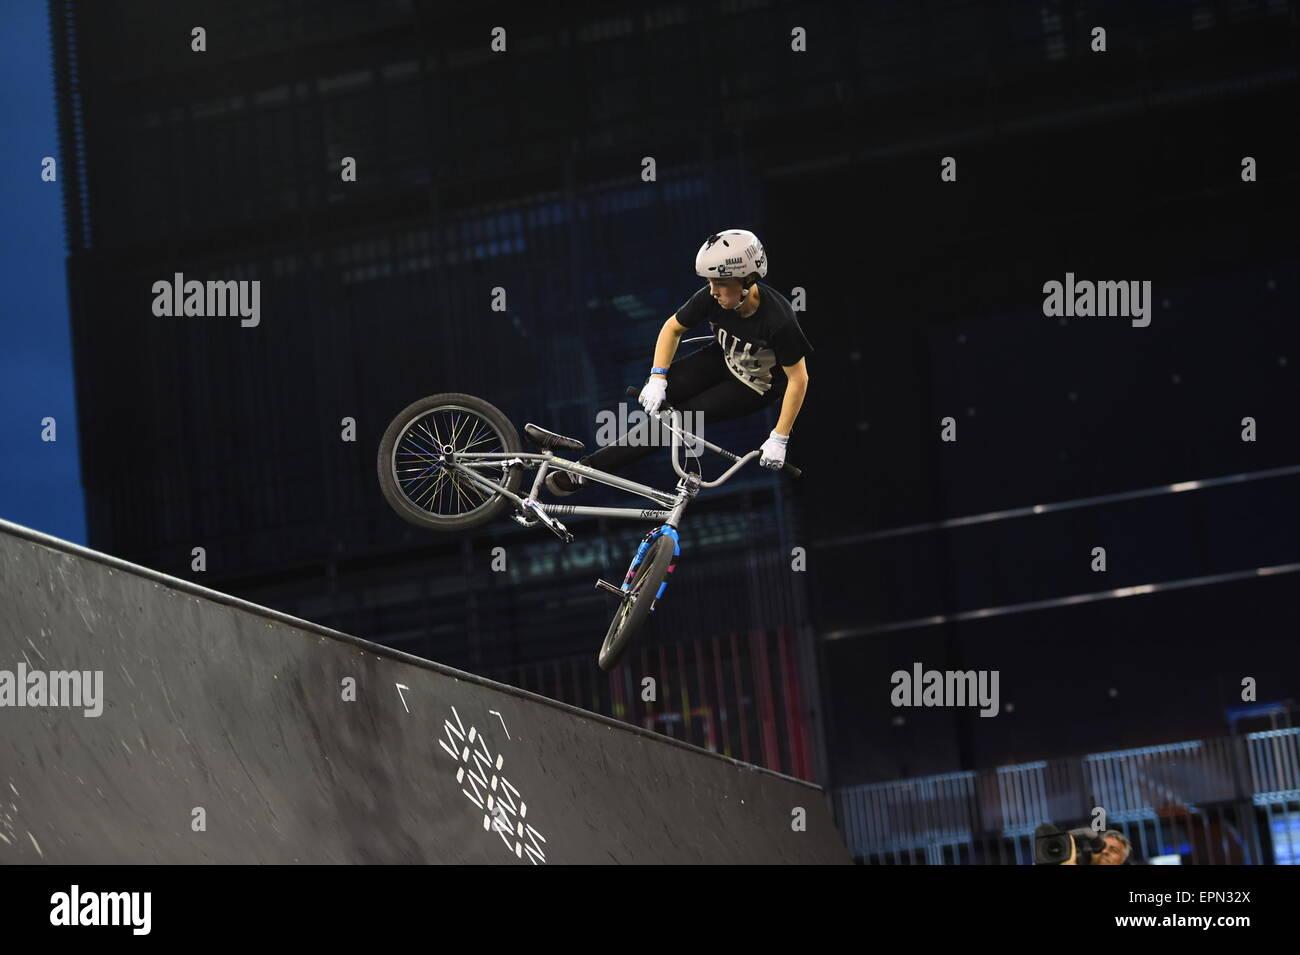 Illustration BMX Spine Ramp - 14.05.2015 - Festival international des sports extremes - Montpellier .Photo : Alexandre - Stock Image